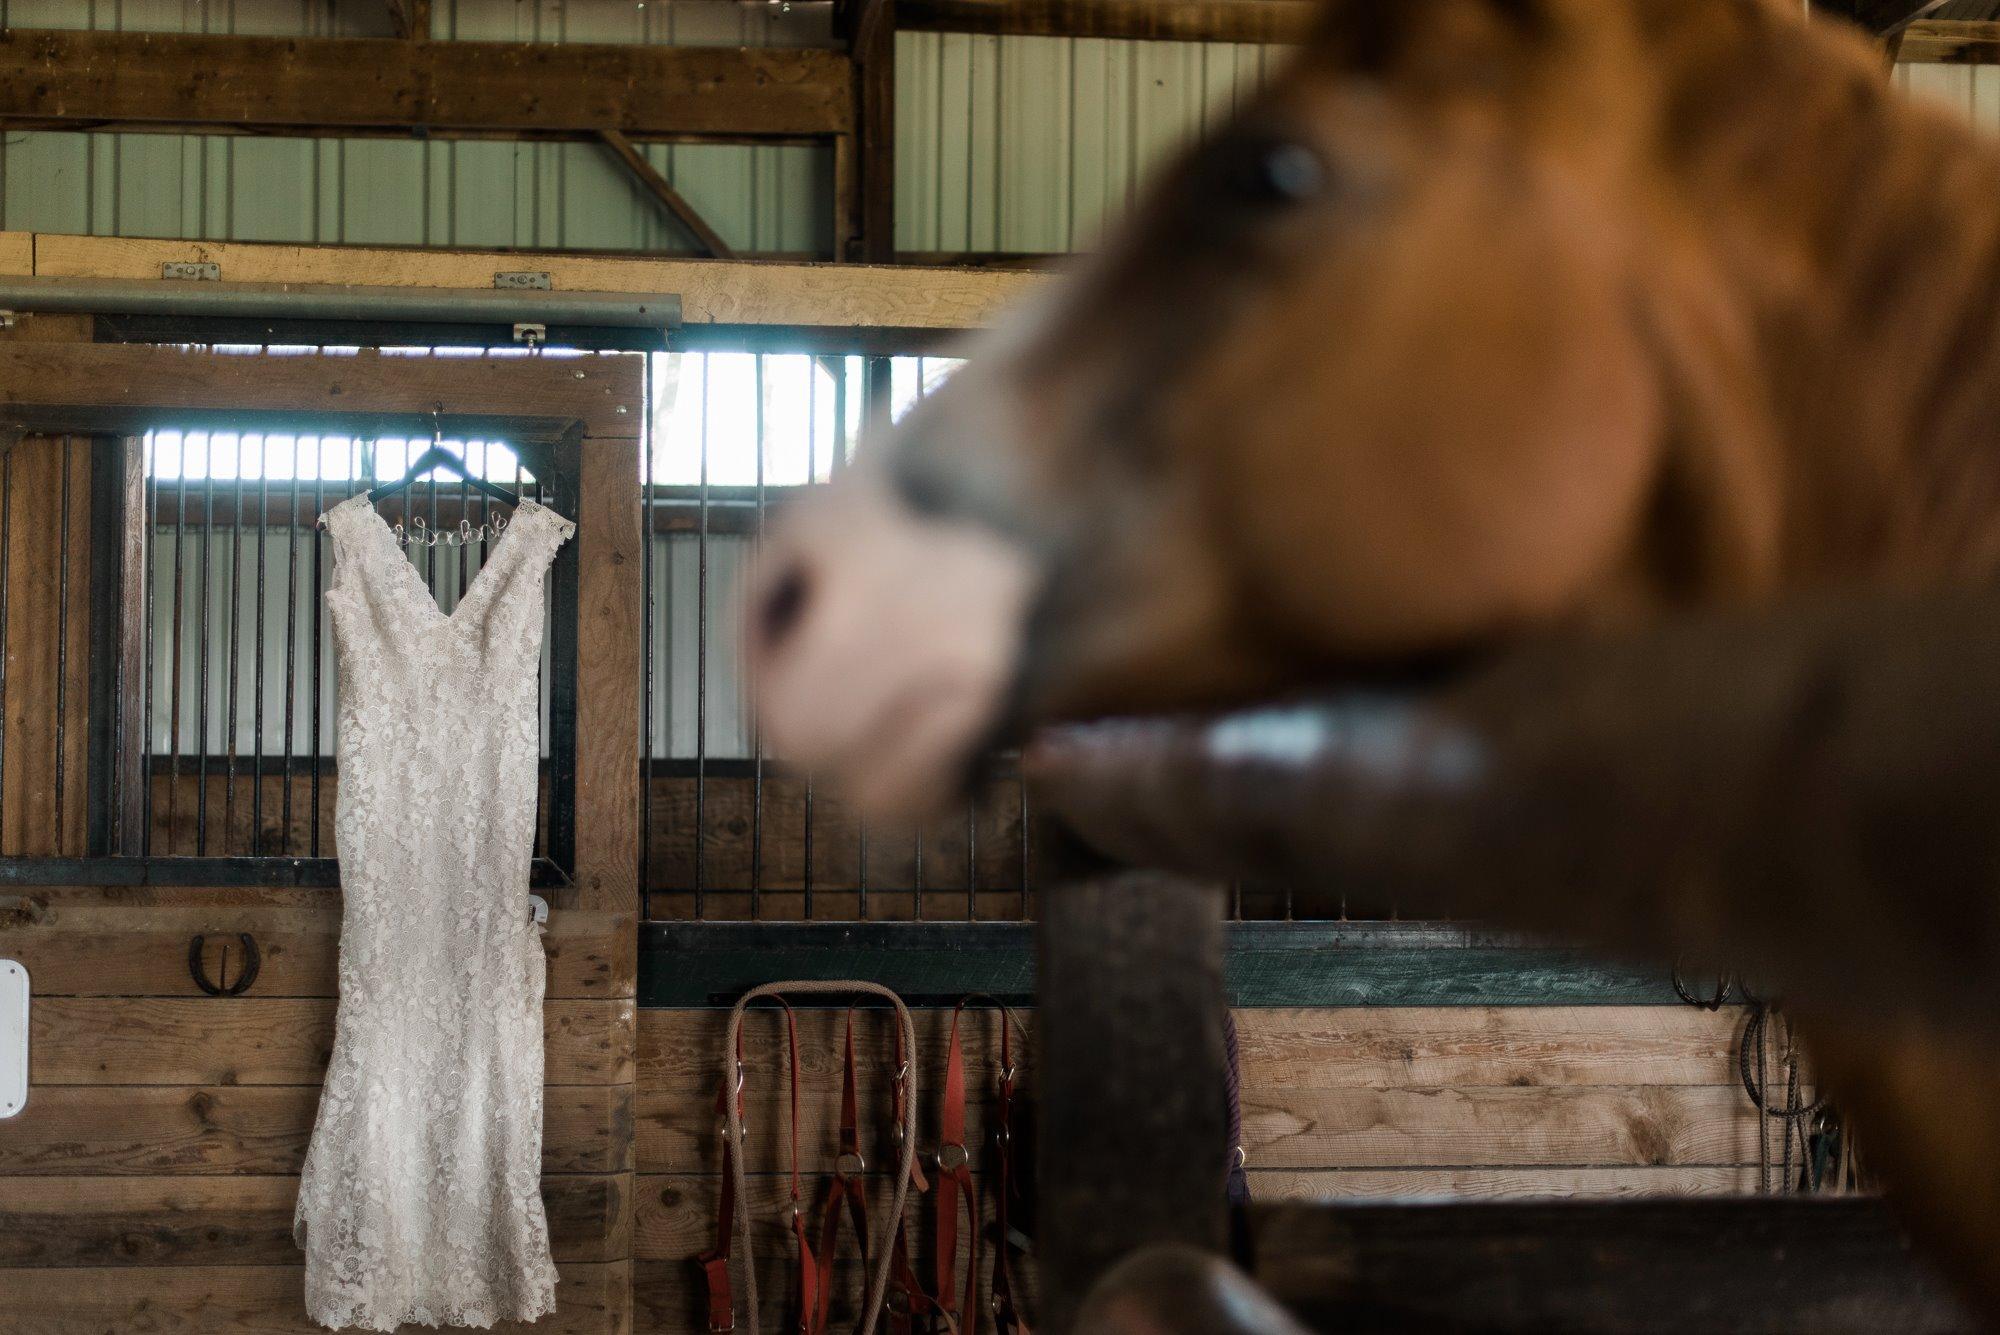 horizon-view-farms-pennsylvania-wedding-barn-rustic-country-0001.jpg